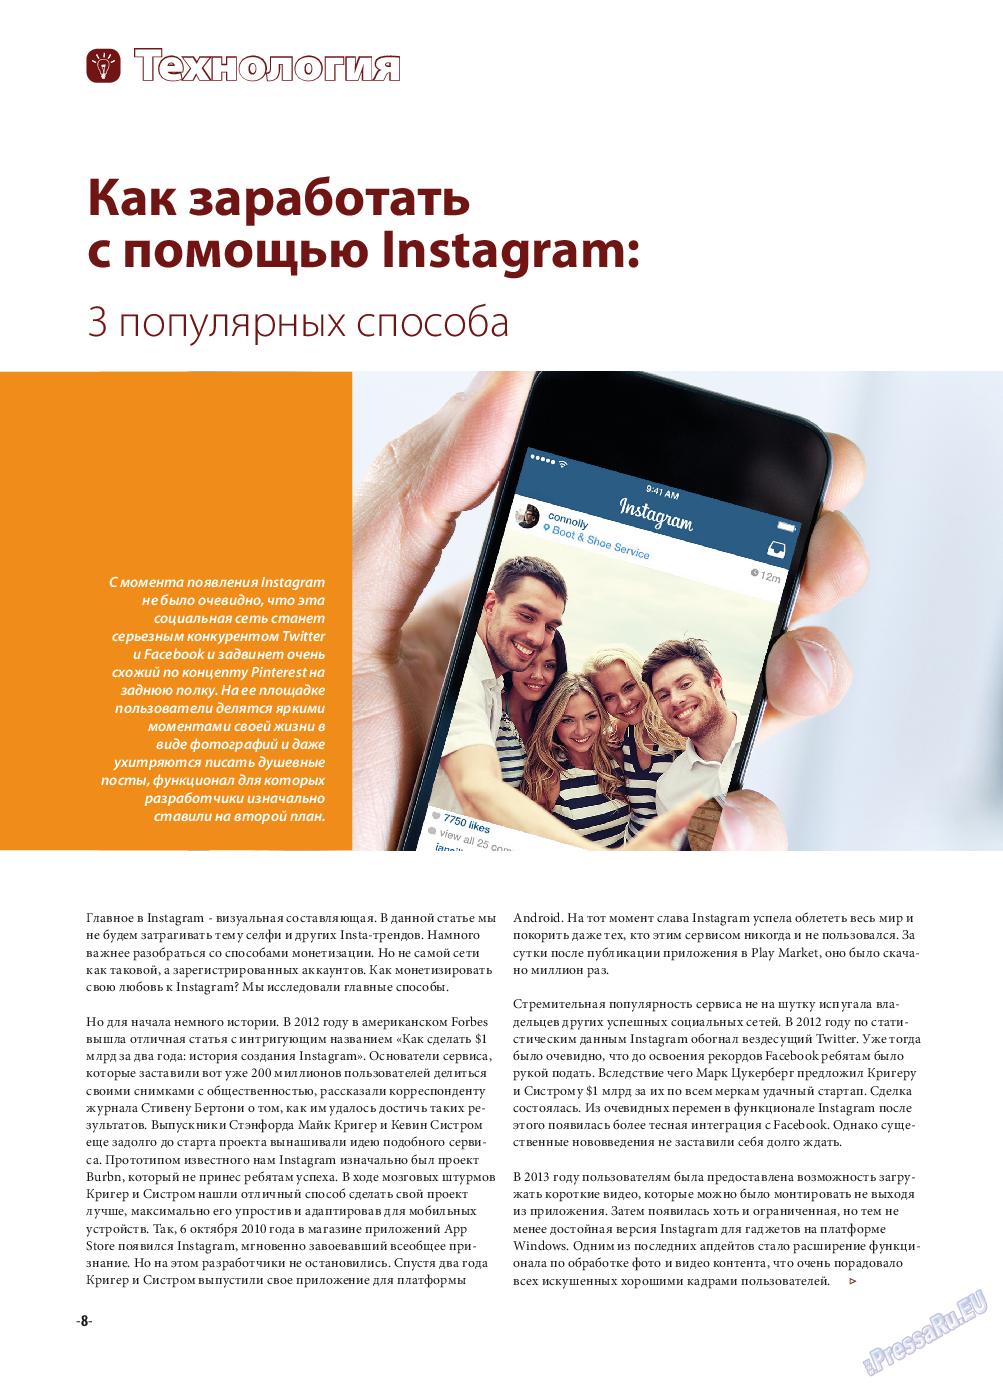 iDEAL (журнал). 2015 год, номер 6, стр. 8